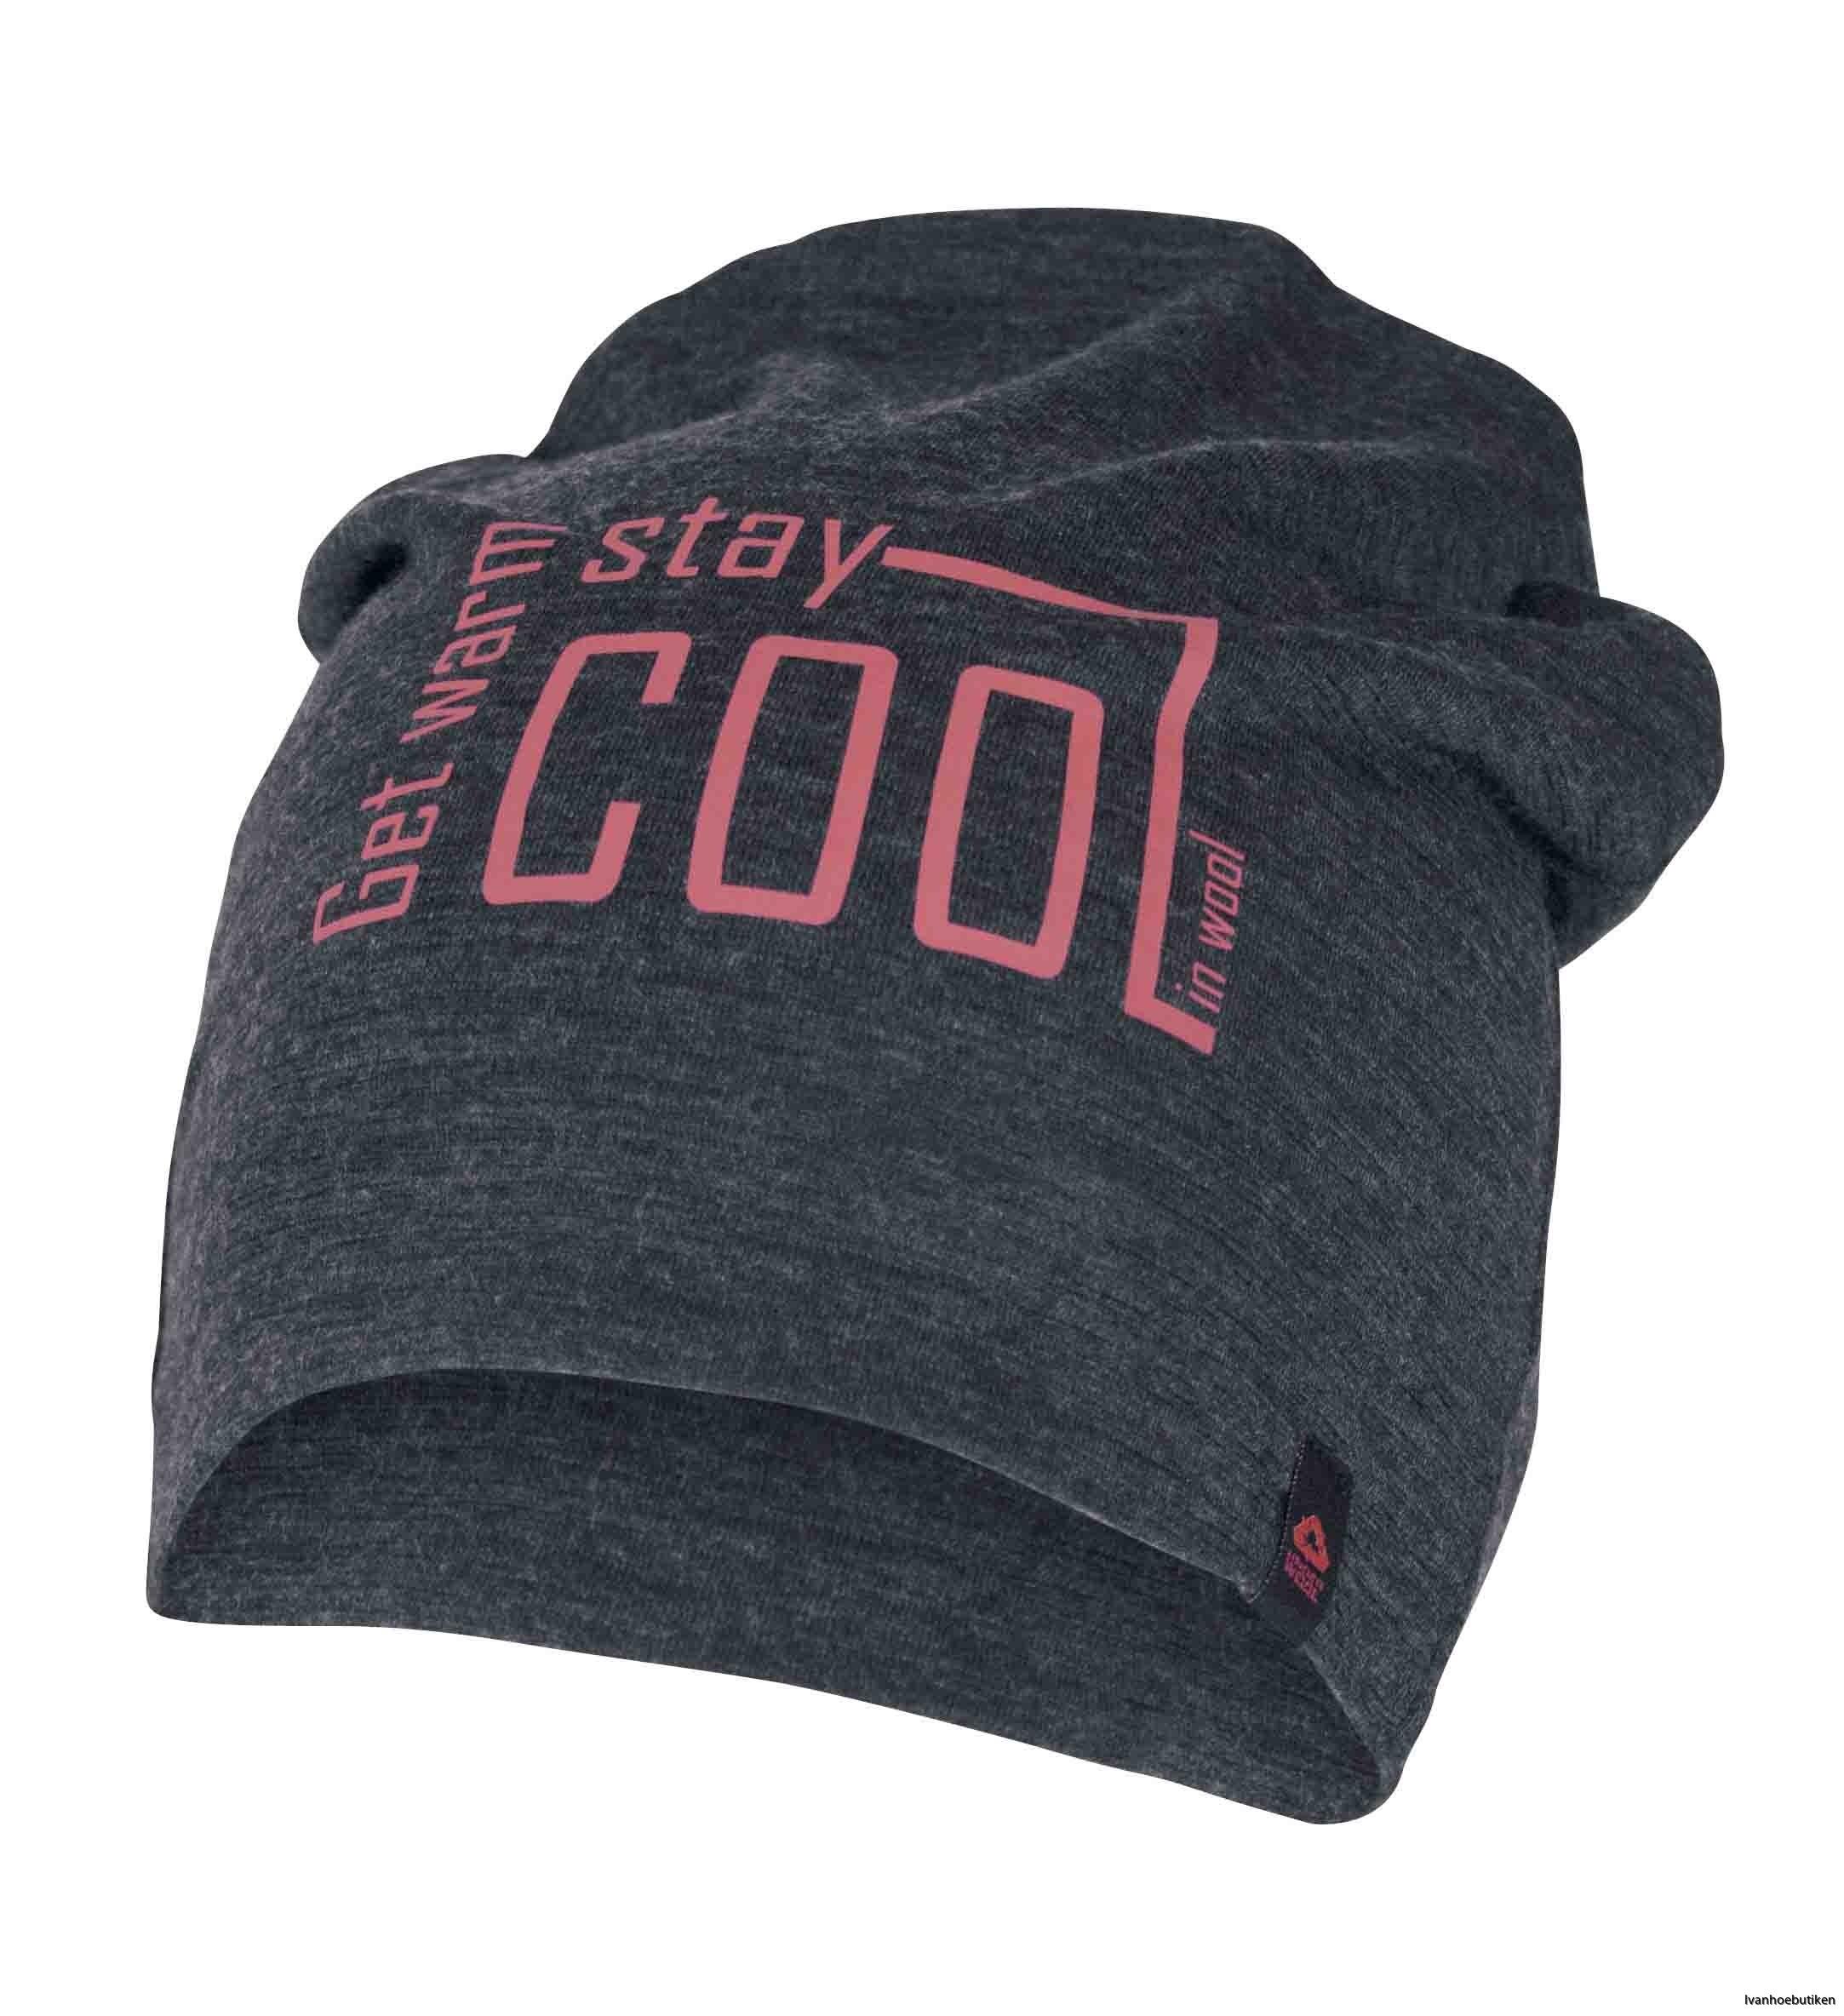 UW_Hat_Stay_Cool_55